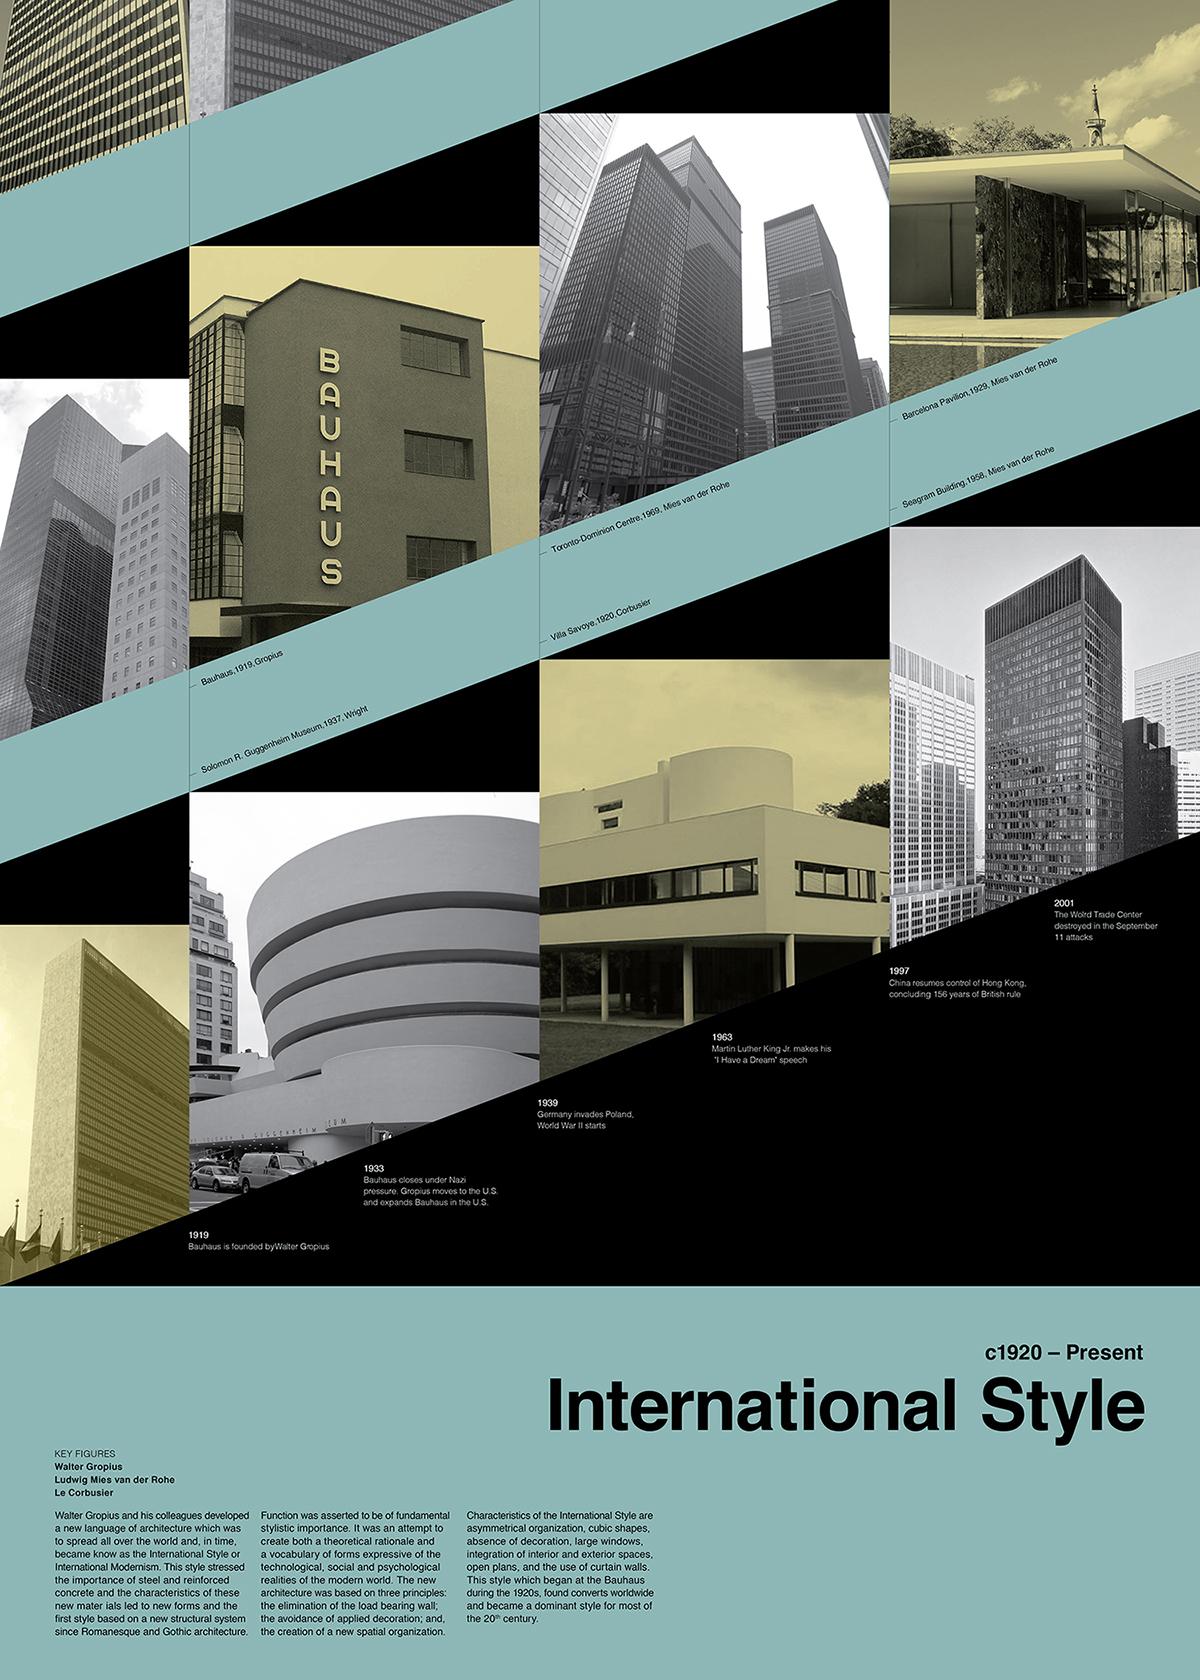 internationalstyle.jpg.